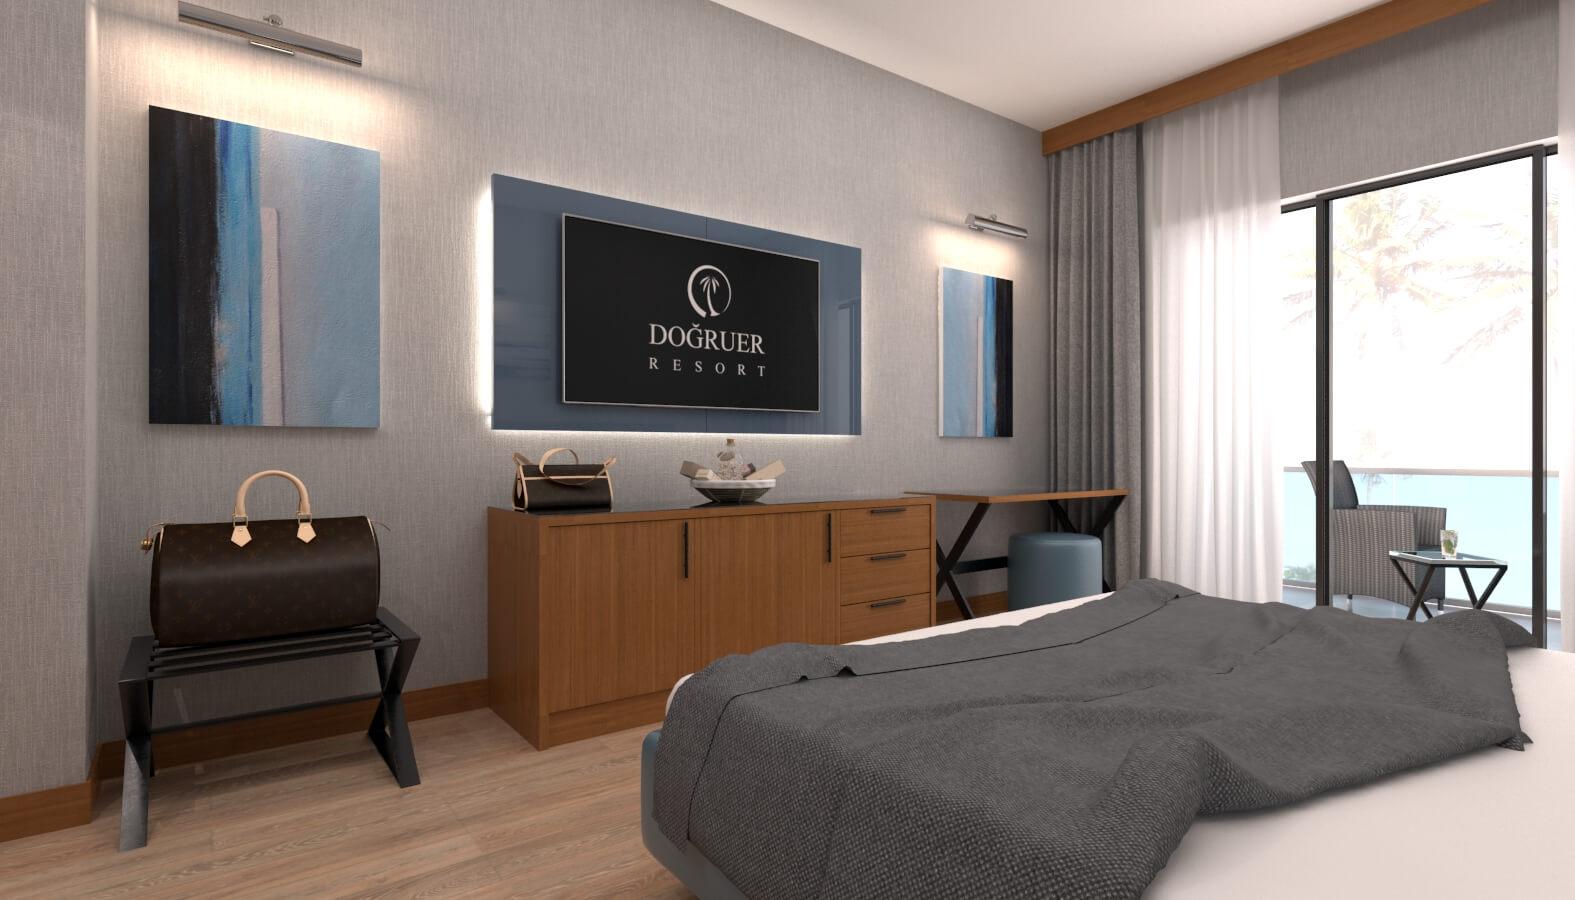 Lobby design 3606 Dogruer hotel Hotels